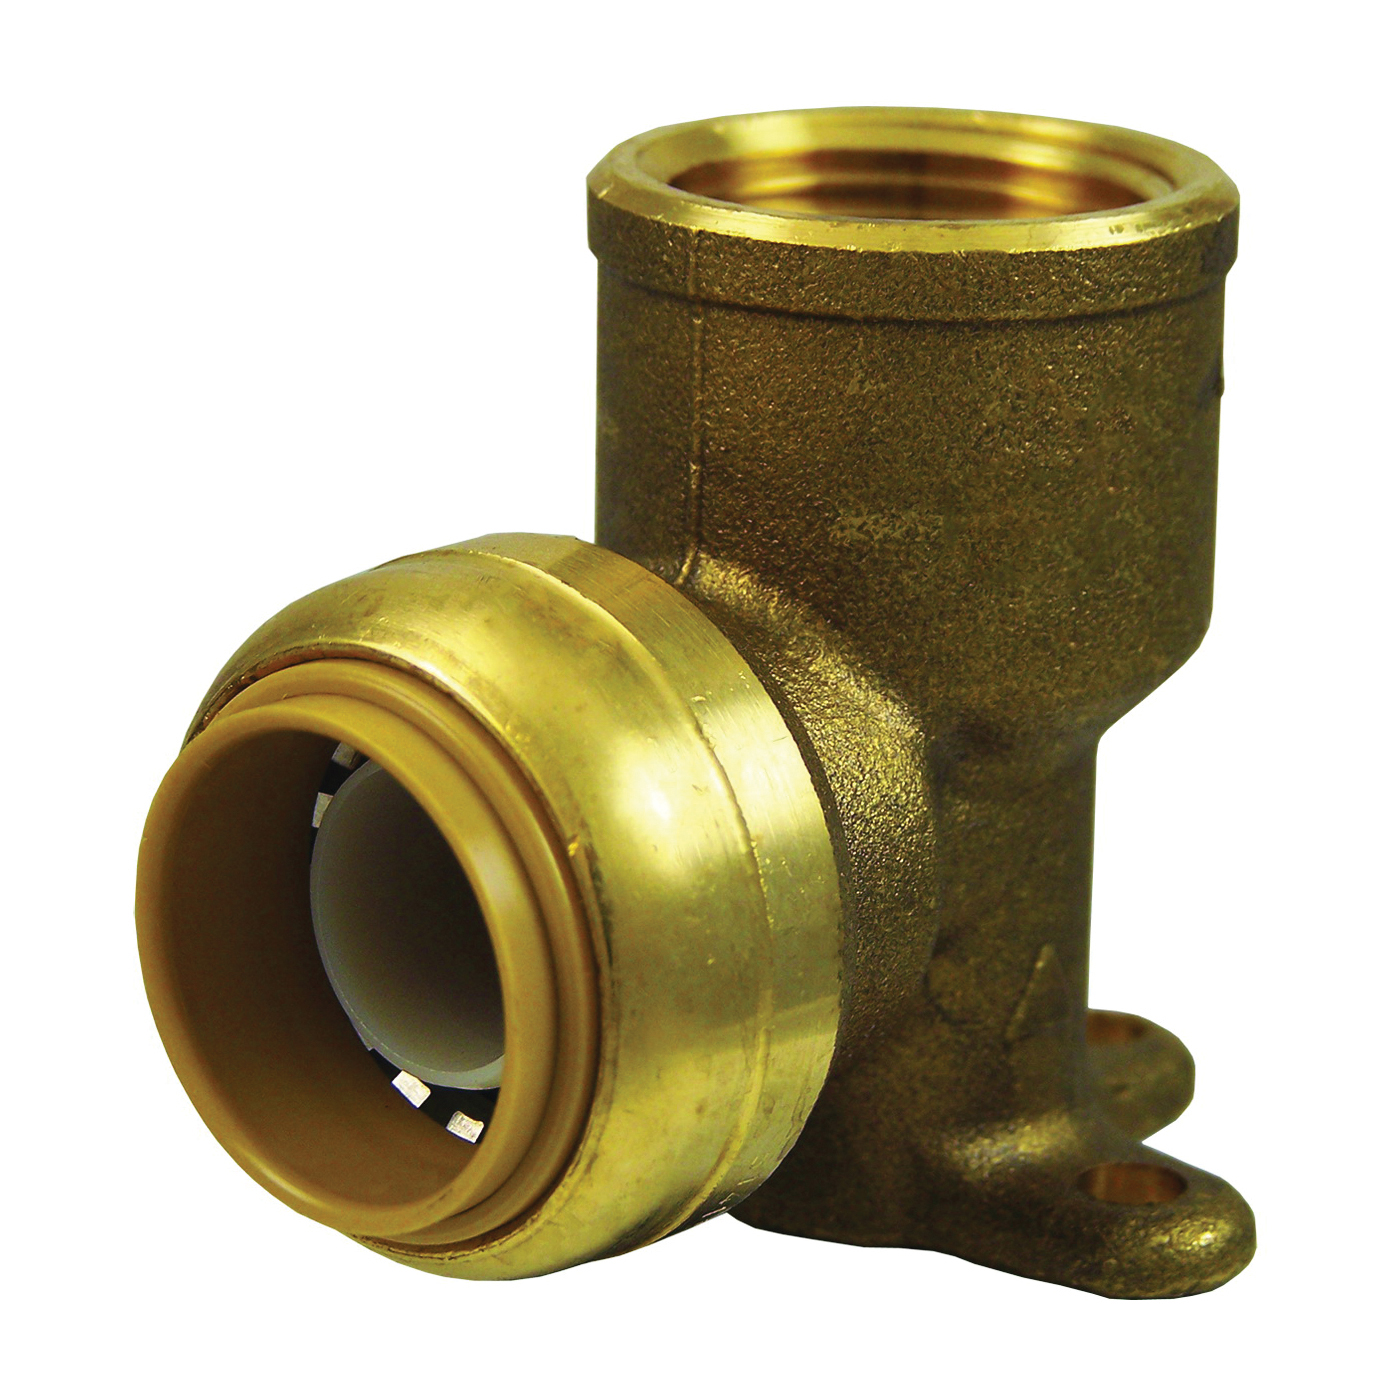 Picture of SharkBite U340LFA Tube to Pipe Elbow, 3/4 in, 90 deg Angle, Brass, 200 psi Pressure